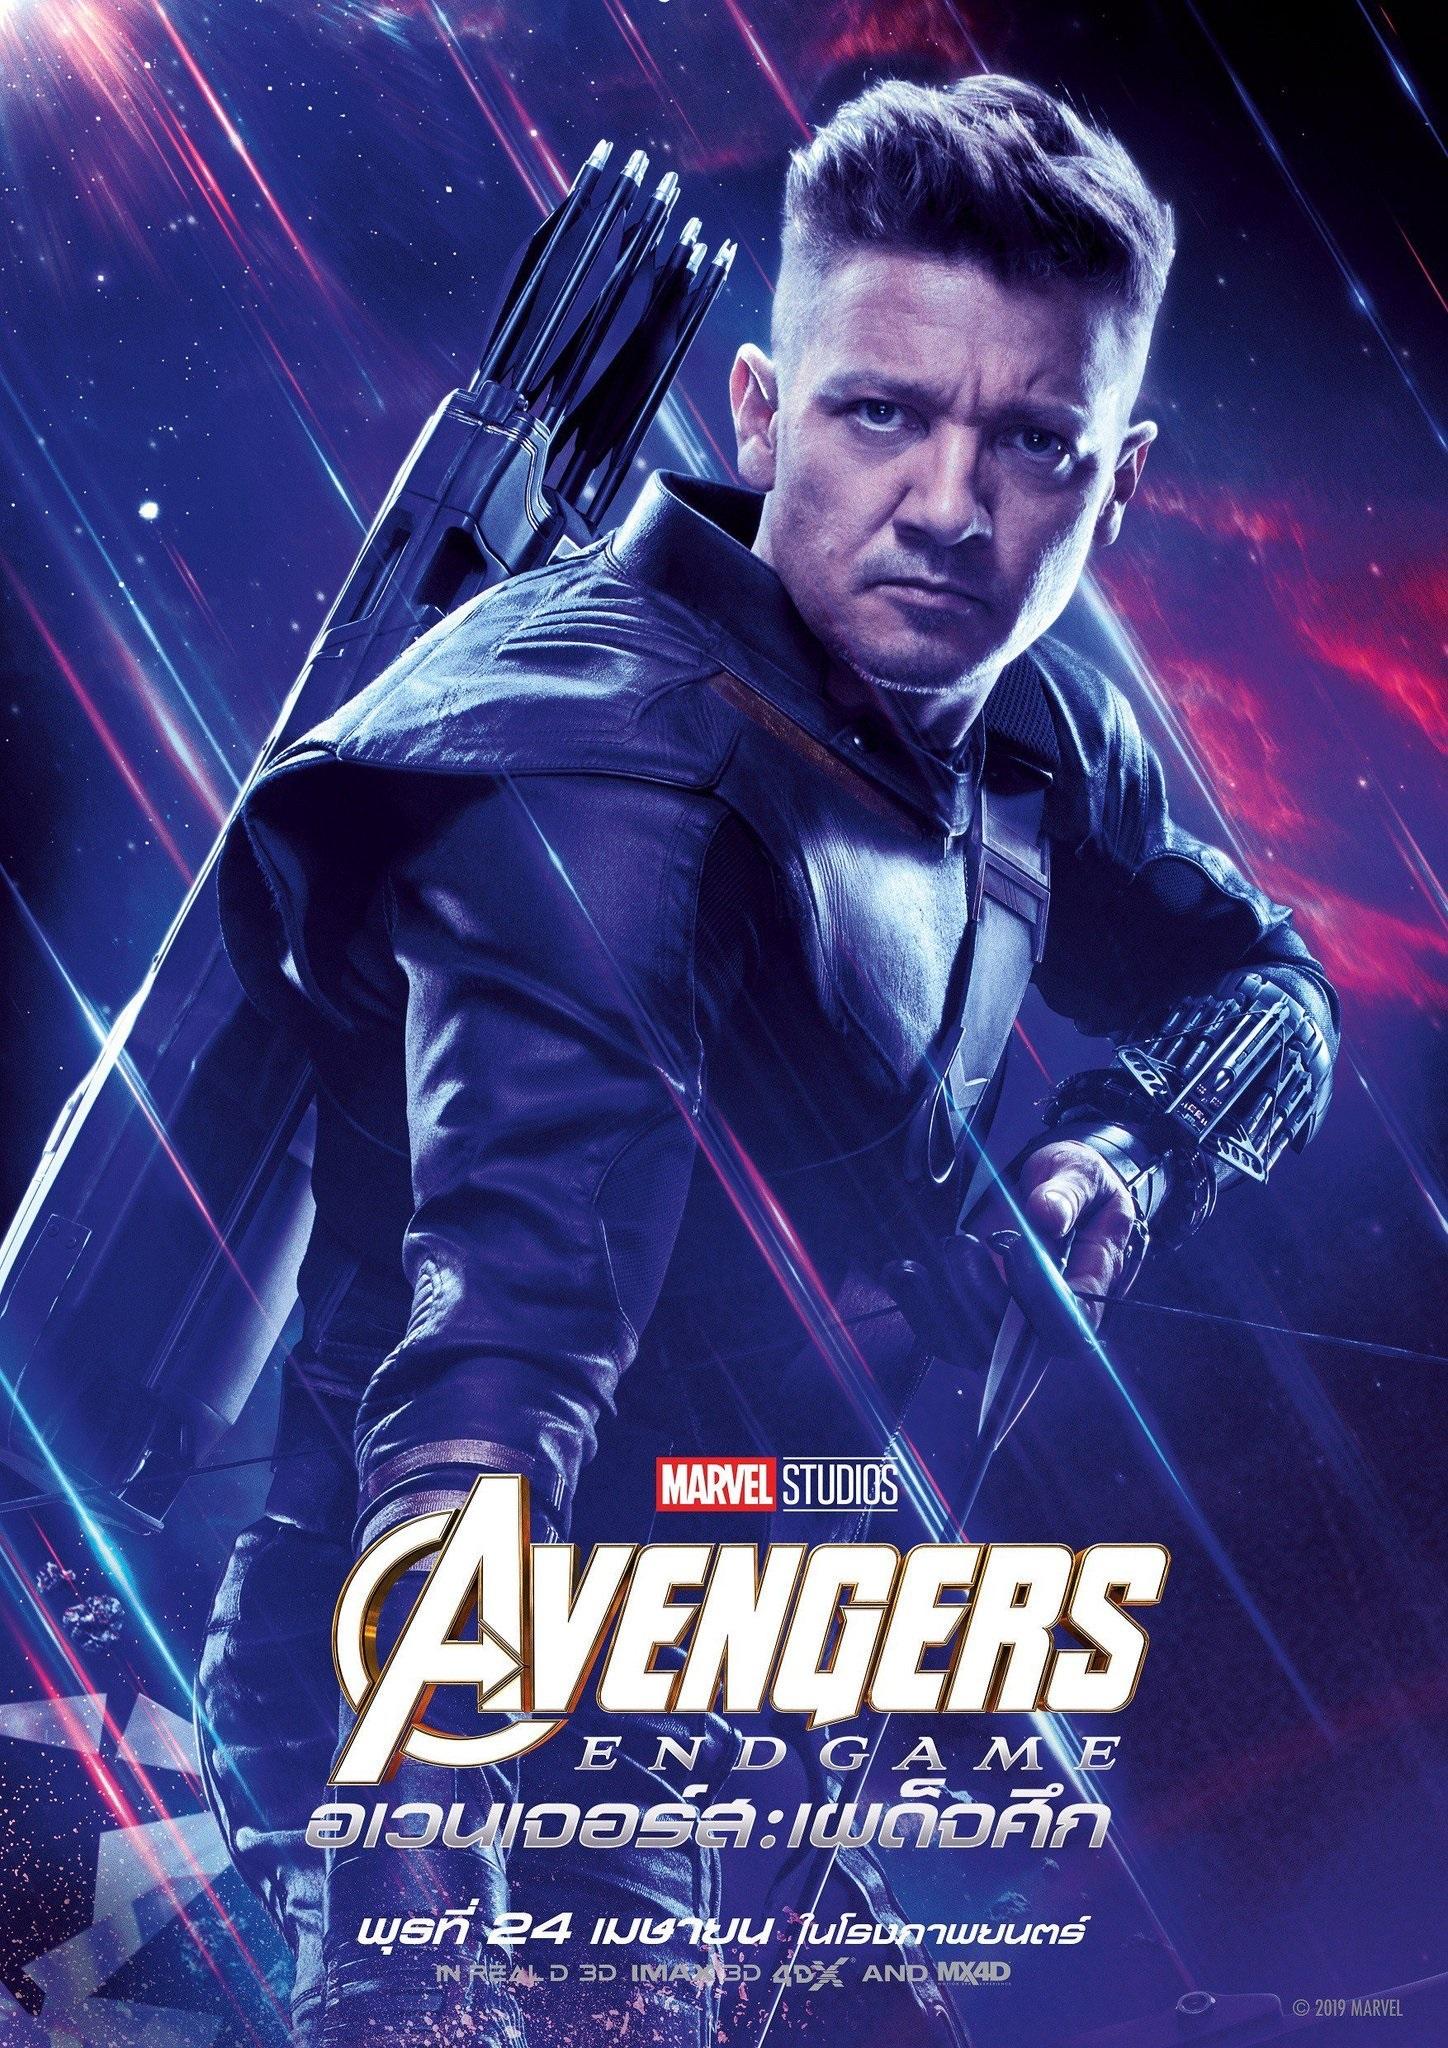 Endgame international character poster for Hawkeye